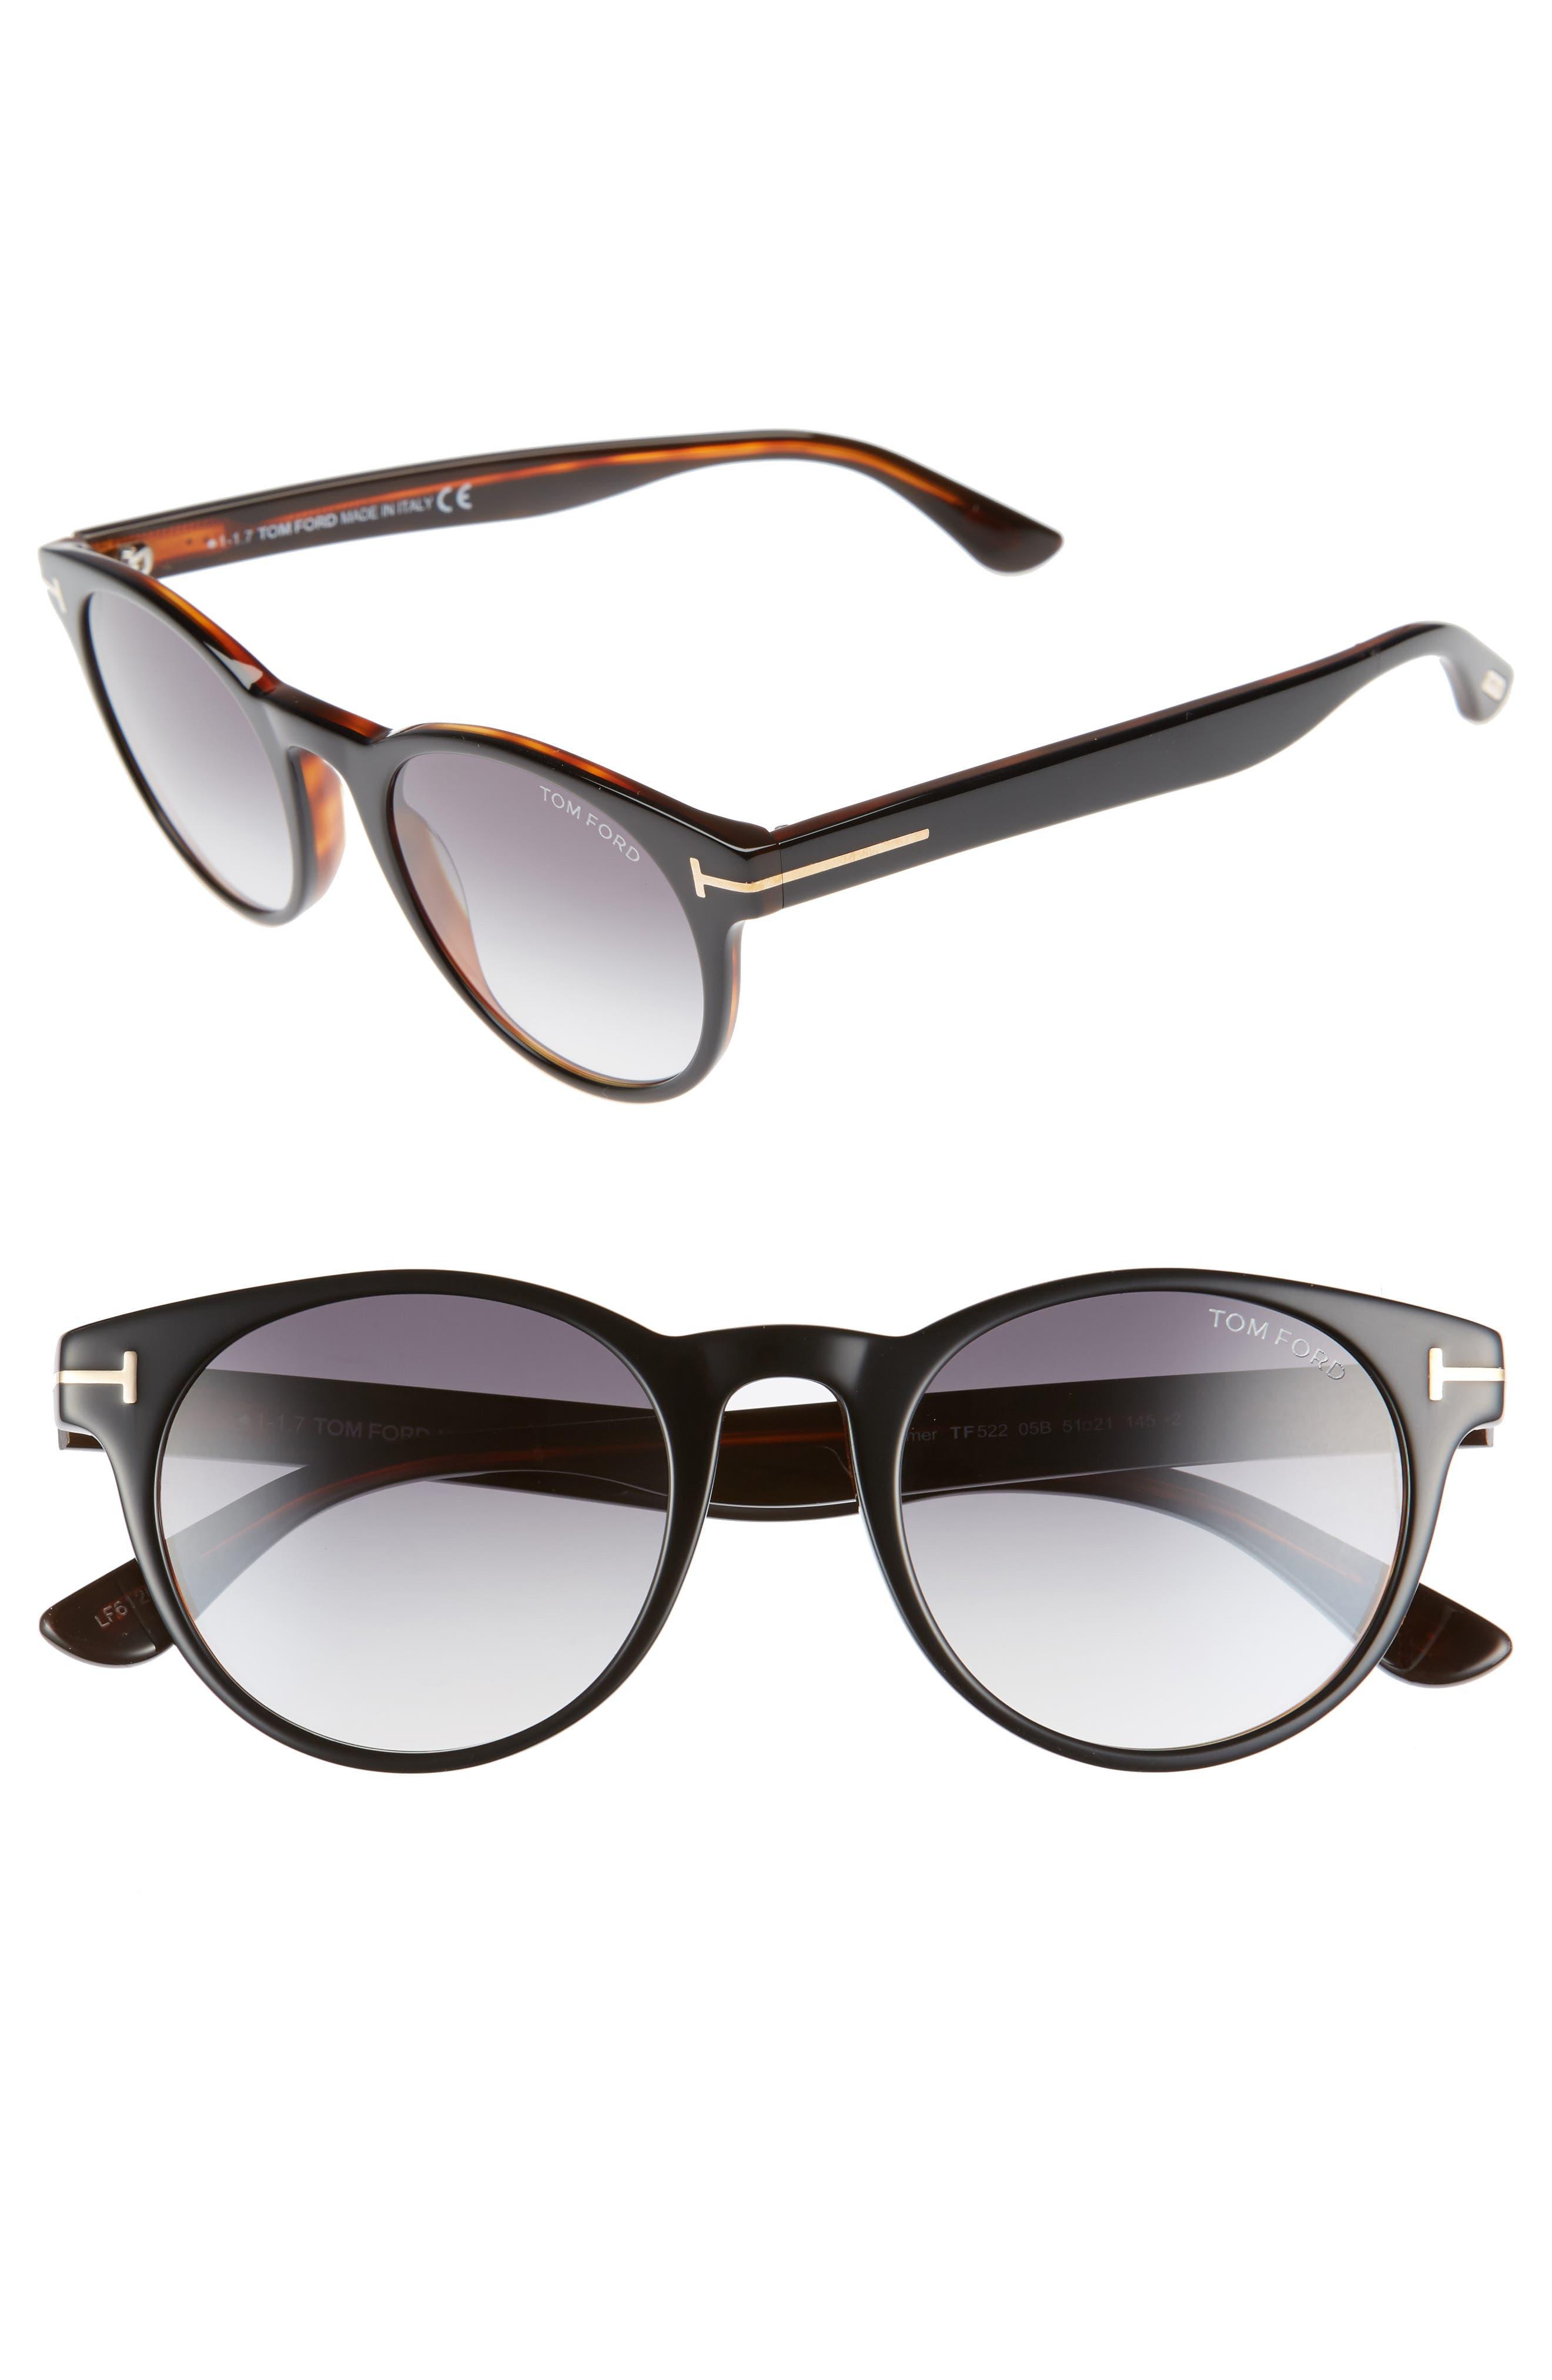 Palmer 51mm Gradient Lens Sunglasses,                             Main thumbnail 1, color,                             001